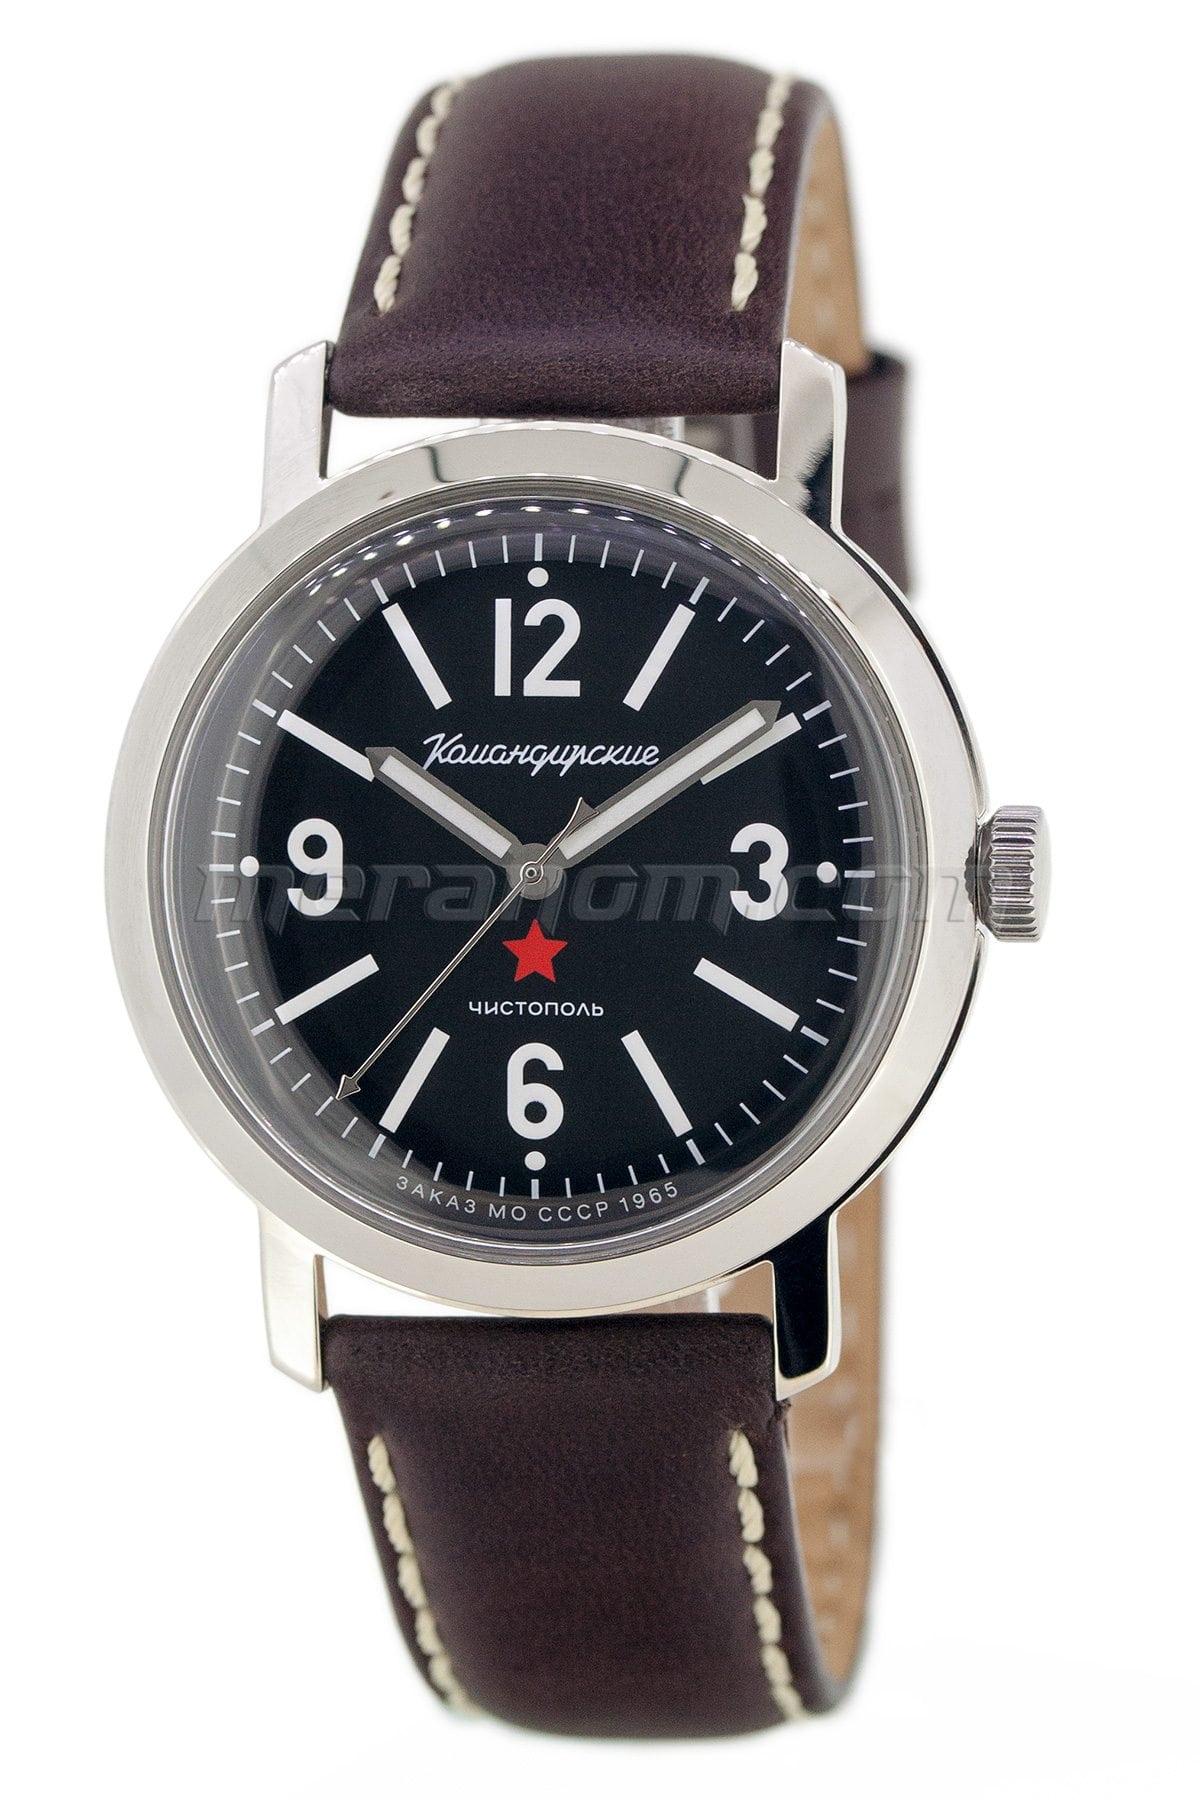 Vostok watch komandirskie 1965 2409a 680b10 buy from an authorized dealer for Komandirskie watches